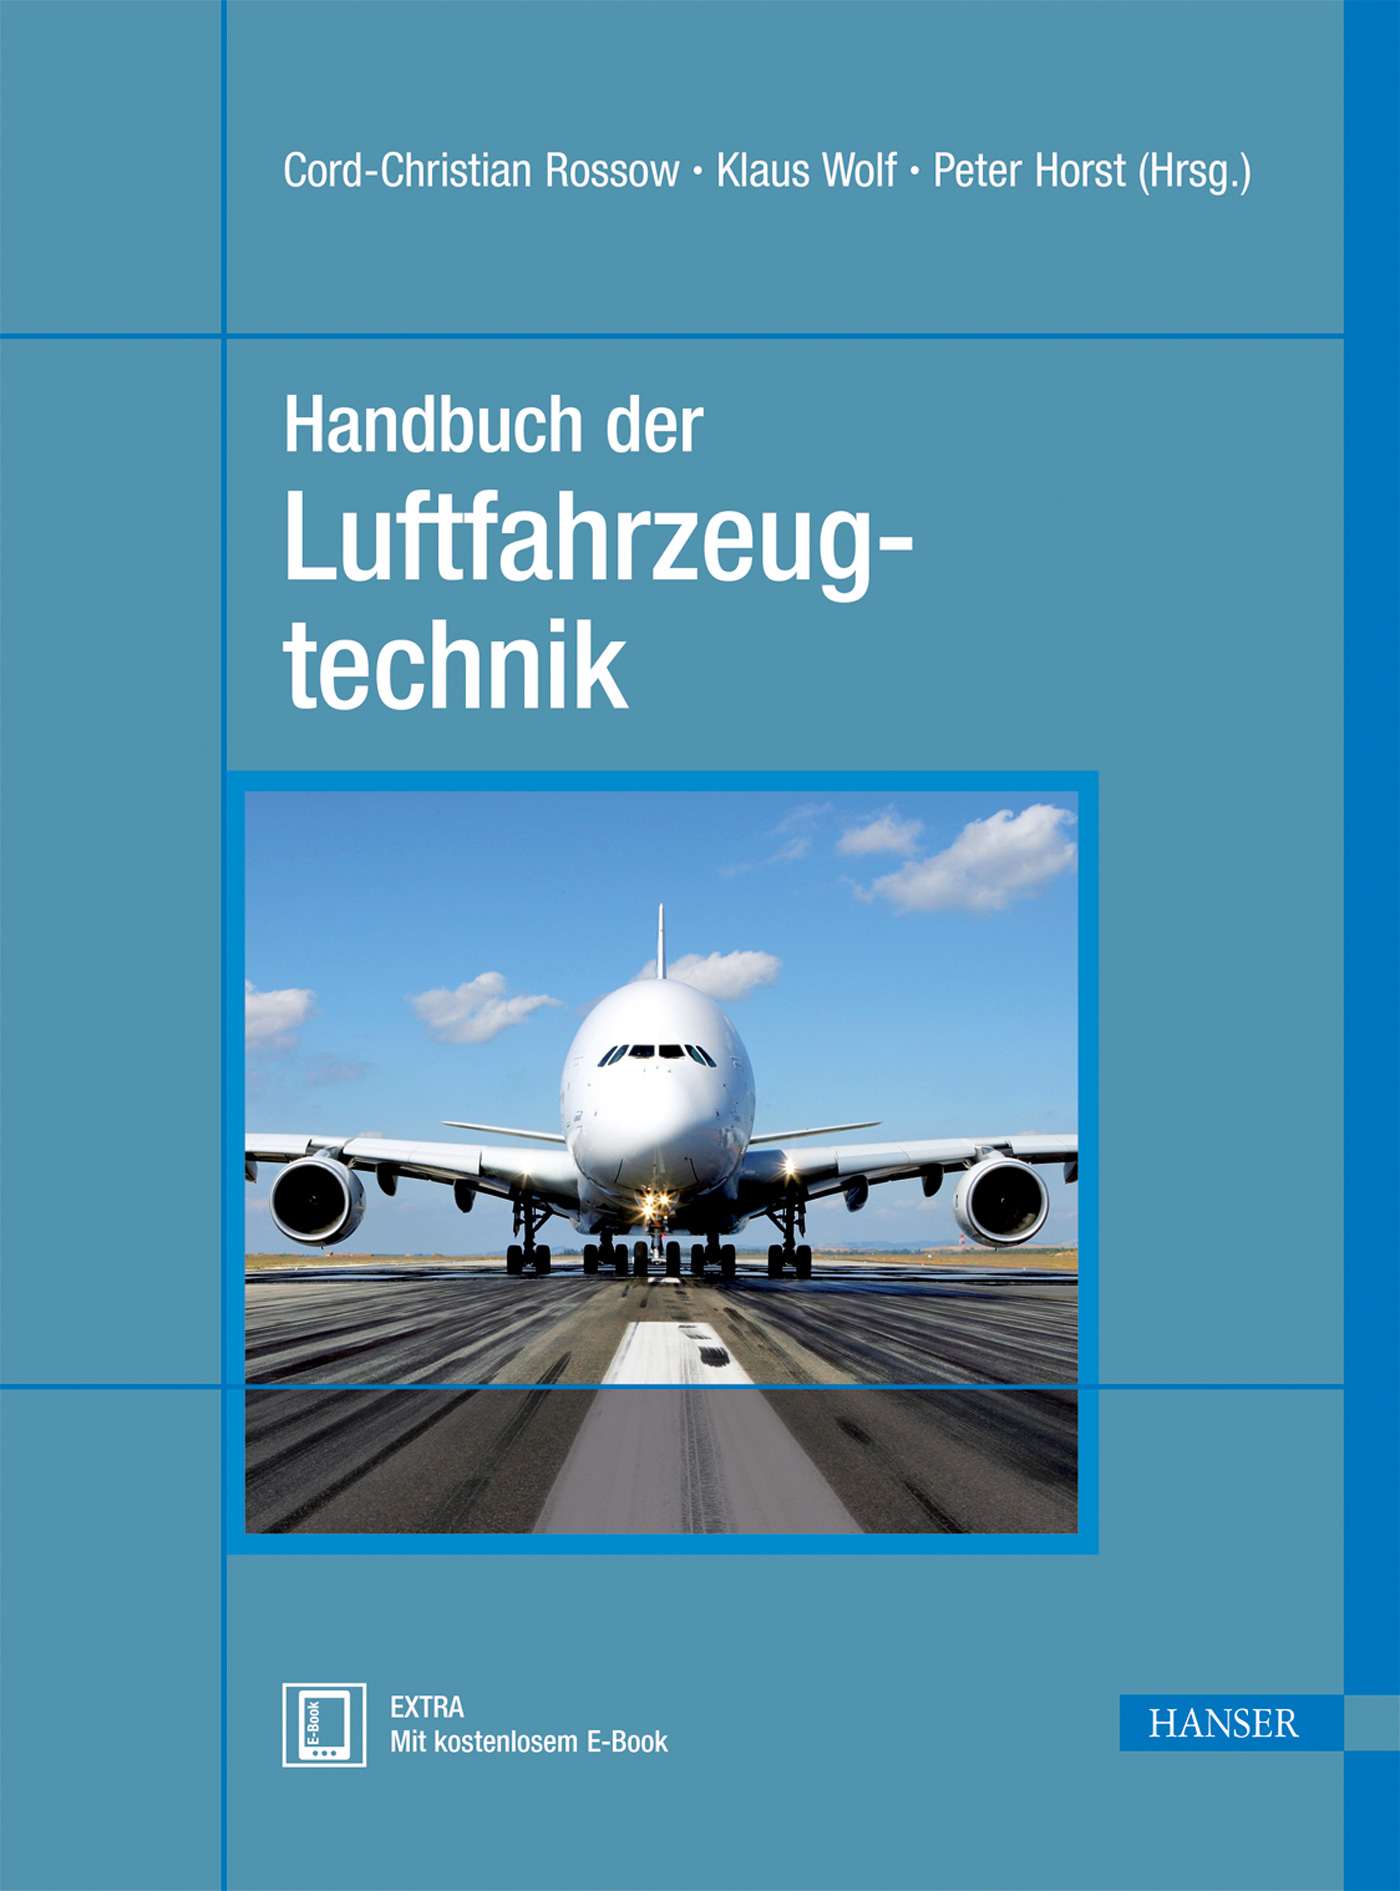 Handbuch der Luftfahrzeugtechnik - Cord-Christian Rossow (Hrsg.) [Gebundene Ausgabe]